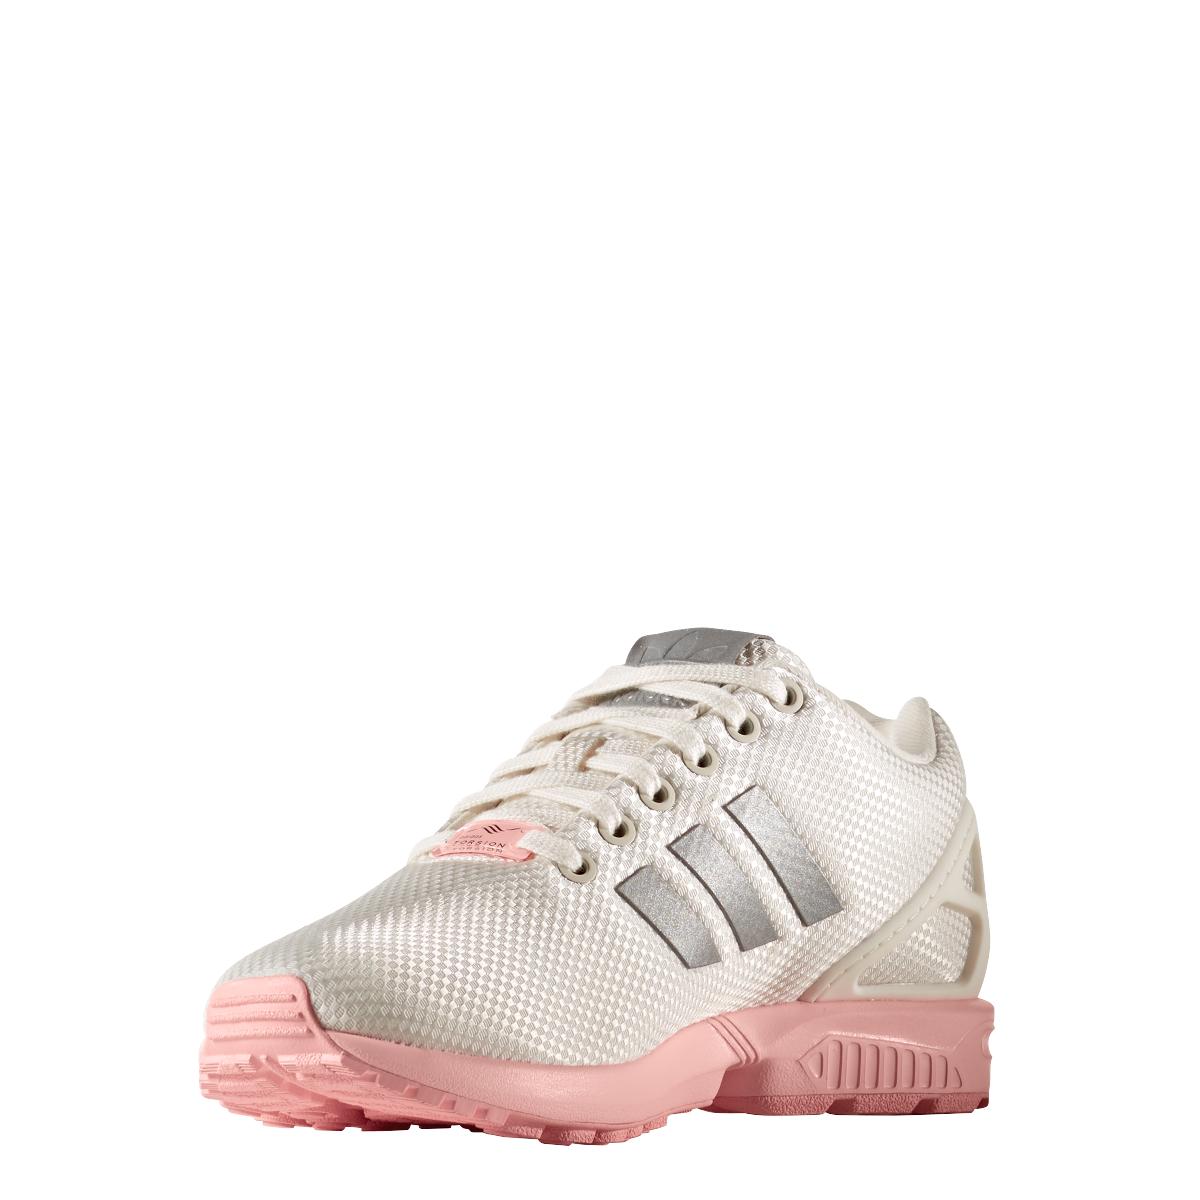 adidas originals zx flux sneaker damen schuhe wei rosa. Black Bedroom Furniture Sets. Home Design Ideas